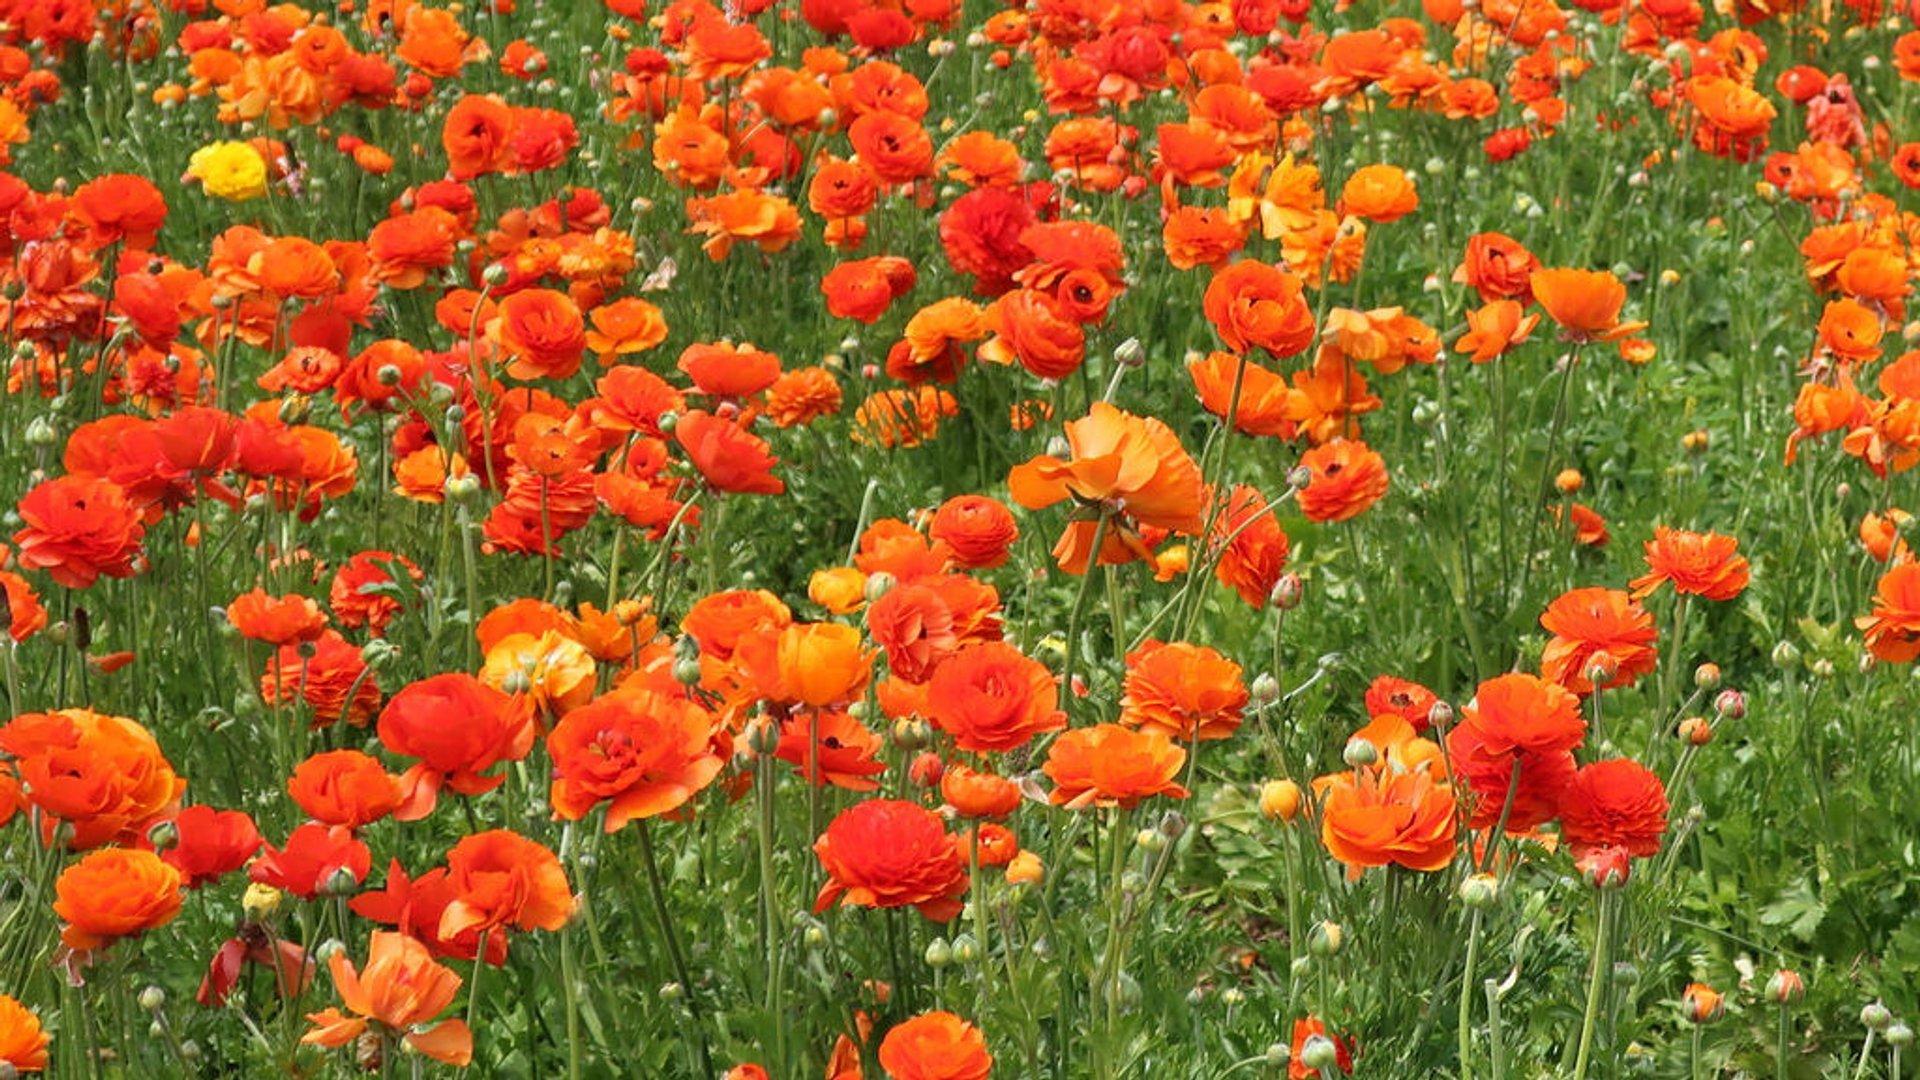 The Flower Fields at Carlsbad Ranch in San Diego - Best Season 2020